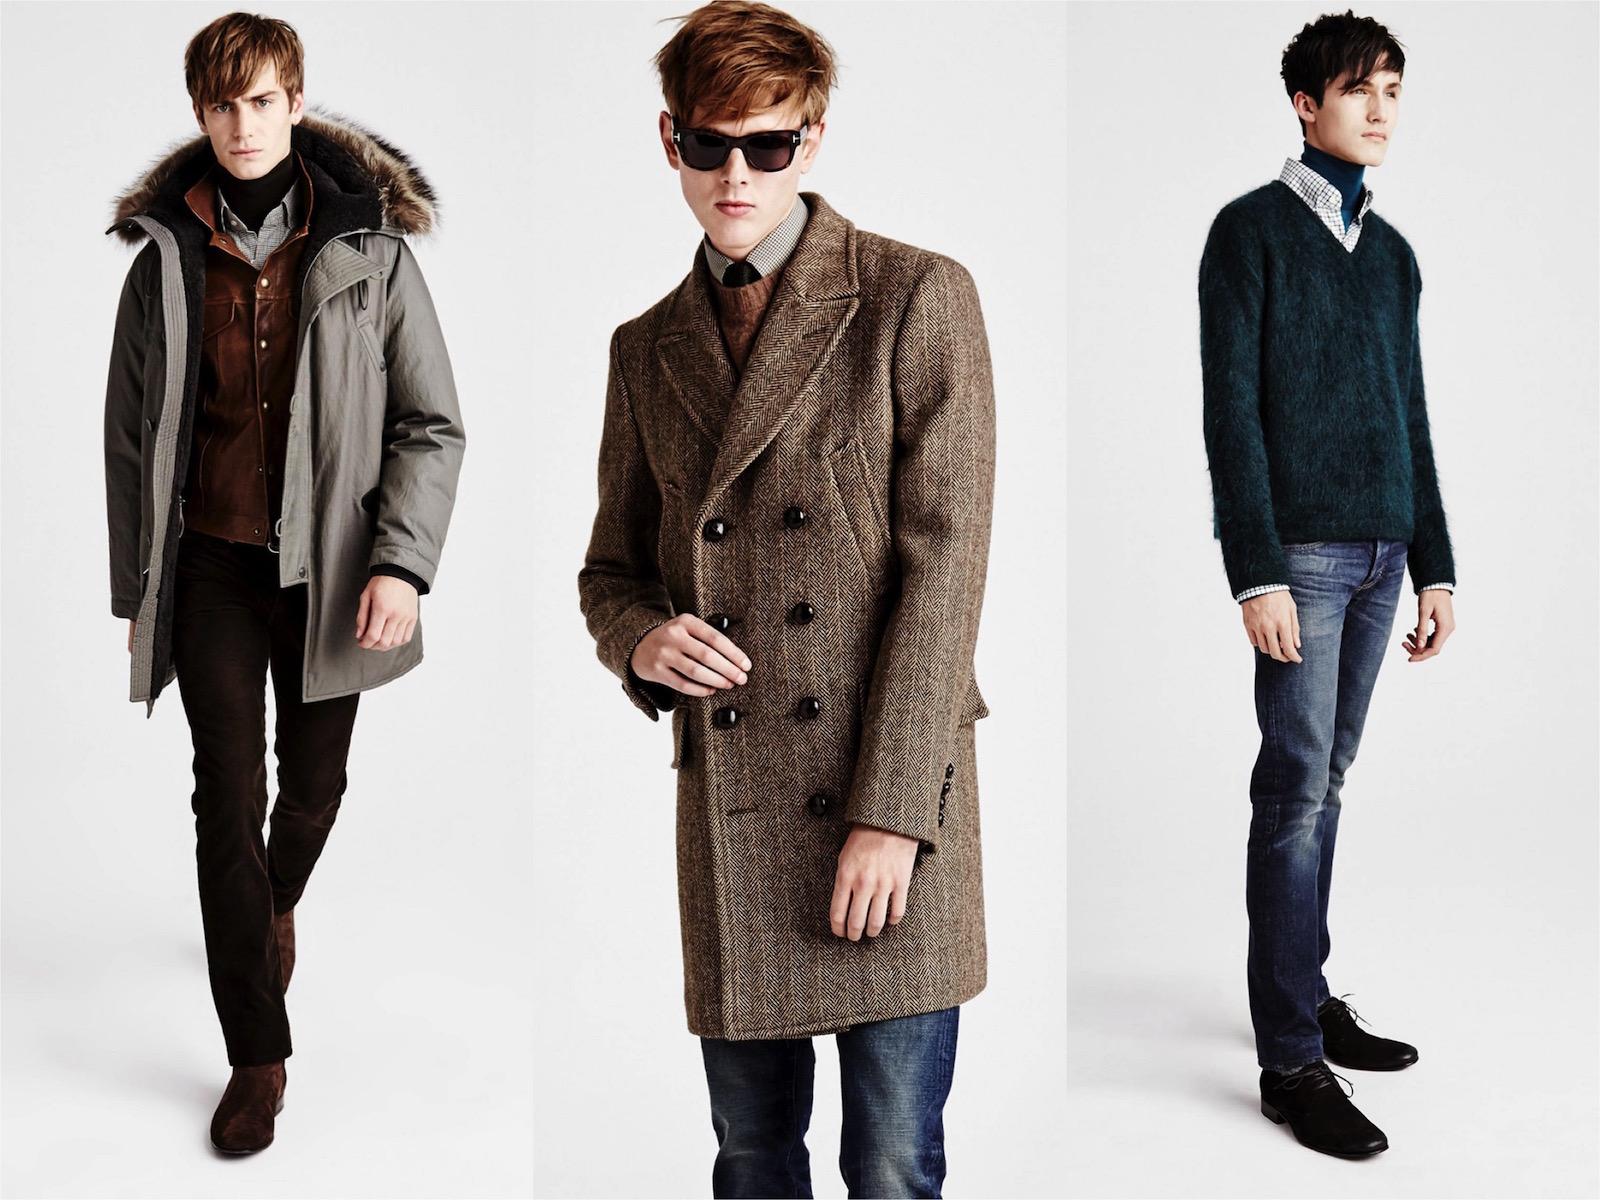 Tom Ford Menswear Fall Winter 2015 (3)